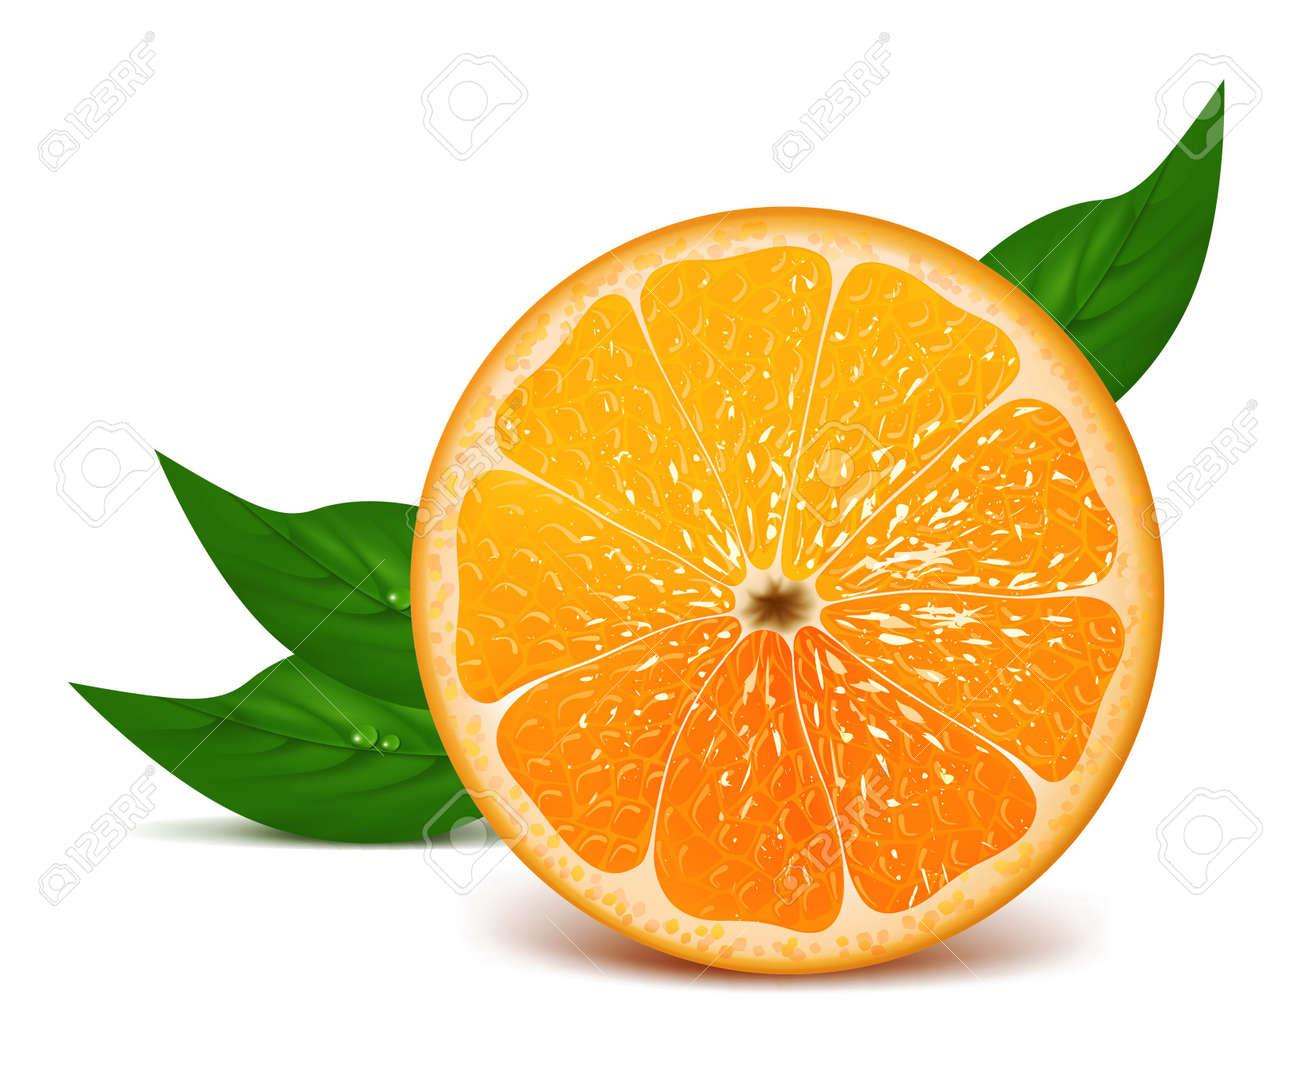 Juicy half of orange with leaves Stock Vector - 15862701